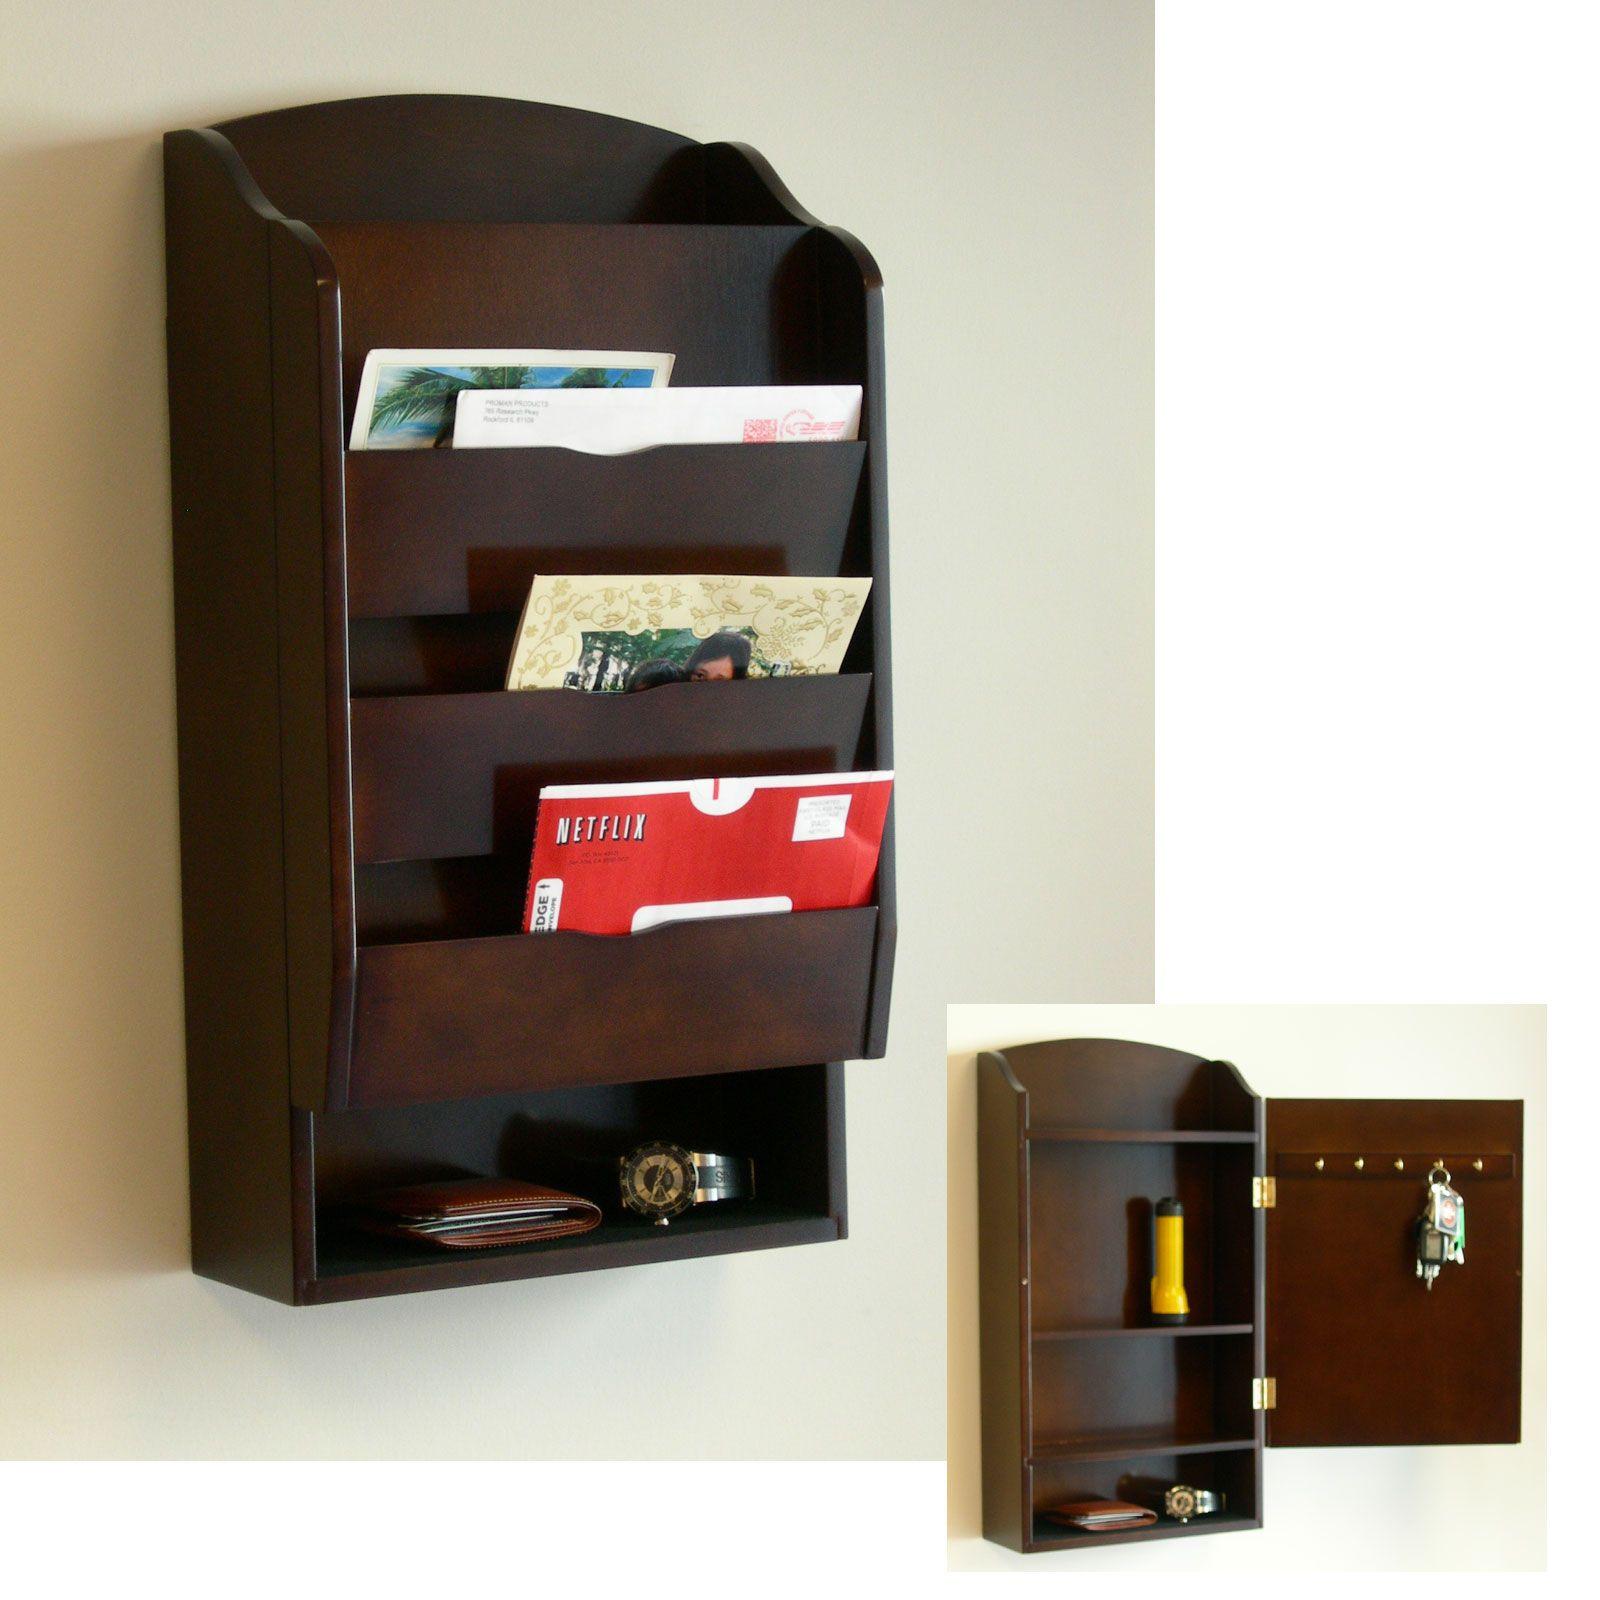 Home Storage Organization Products Furnishing Solutions Mail Organizer Wall Mail Organizer Entry Organization